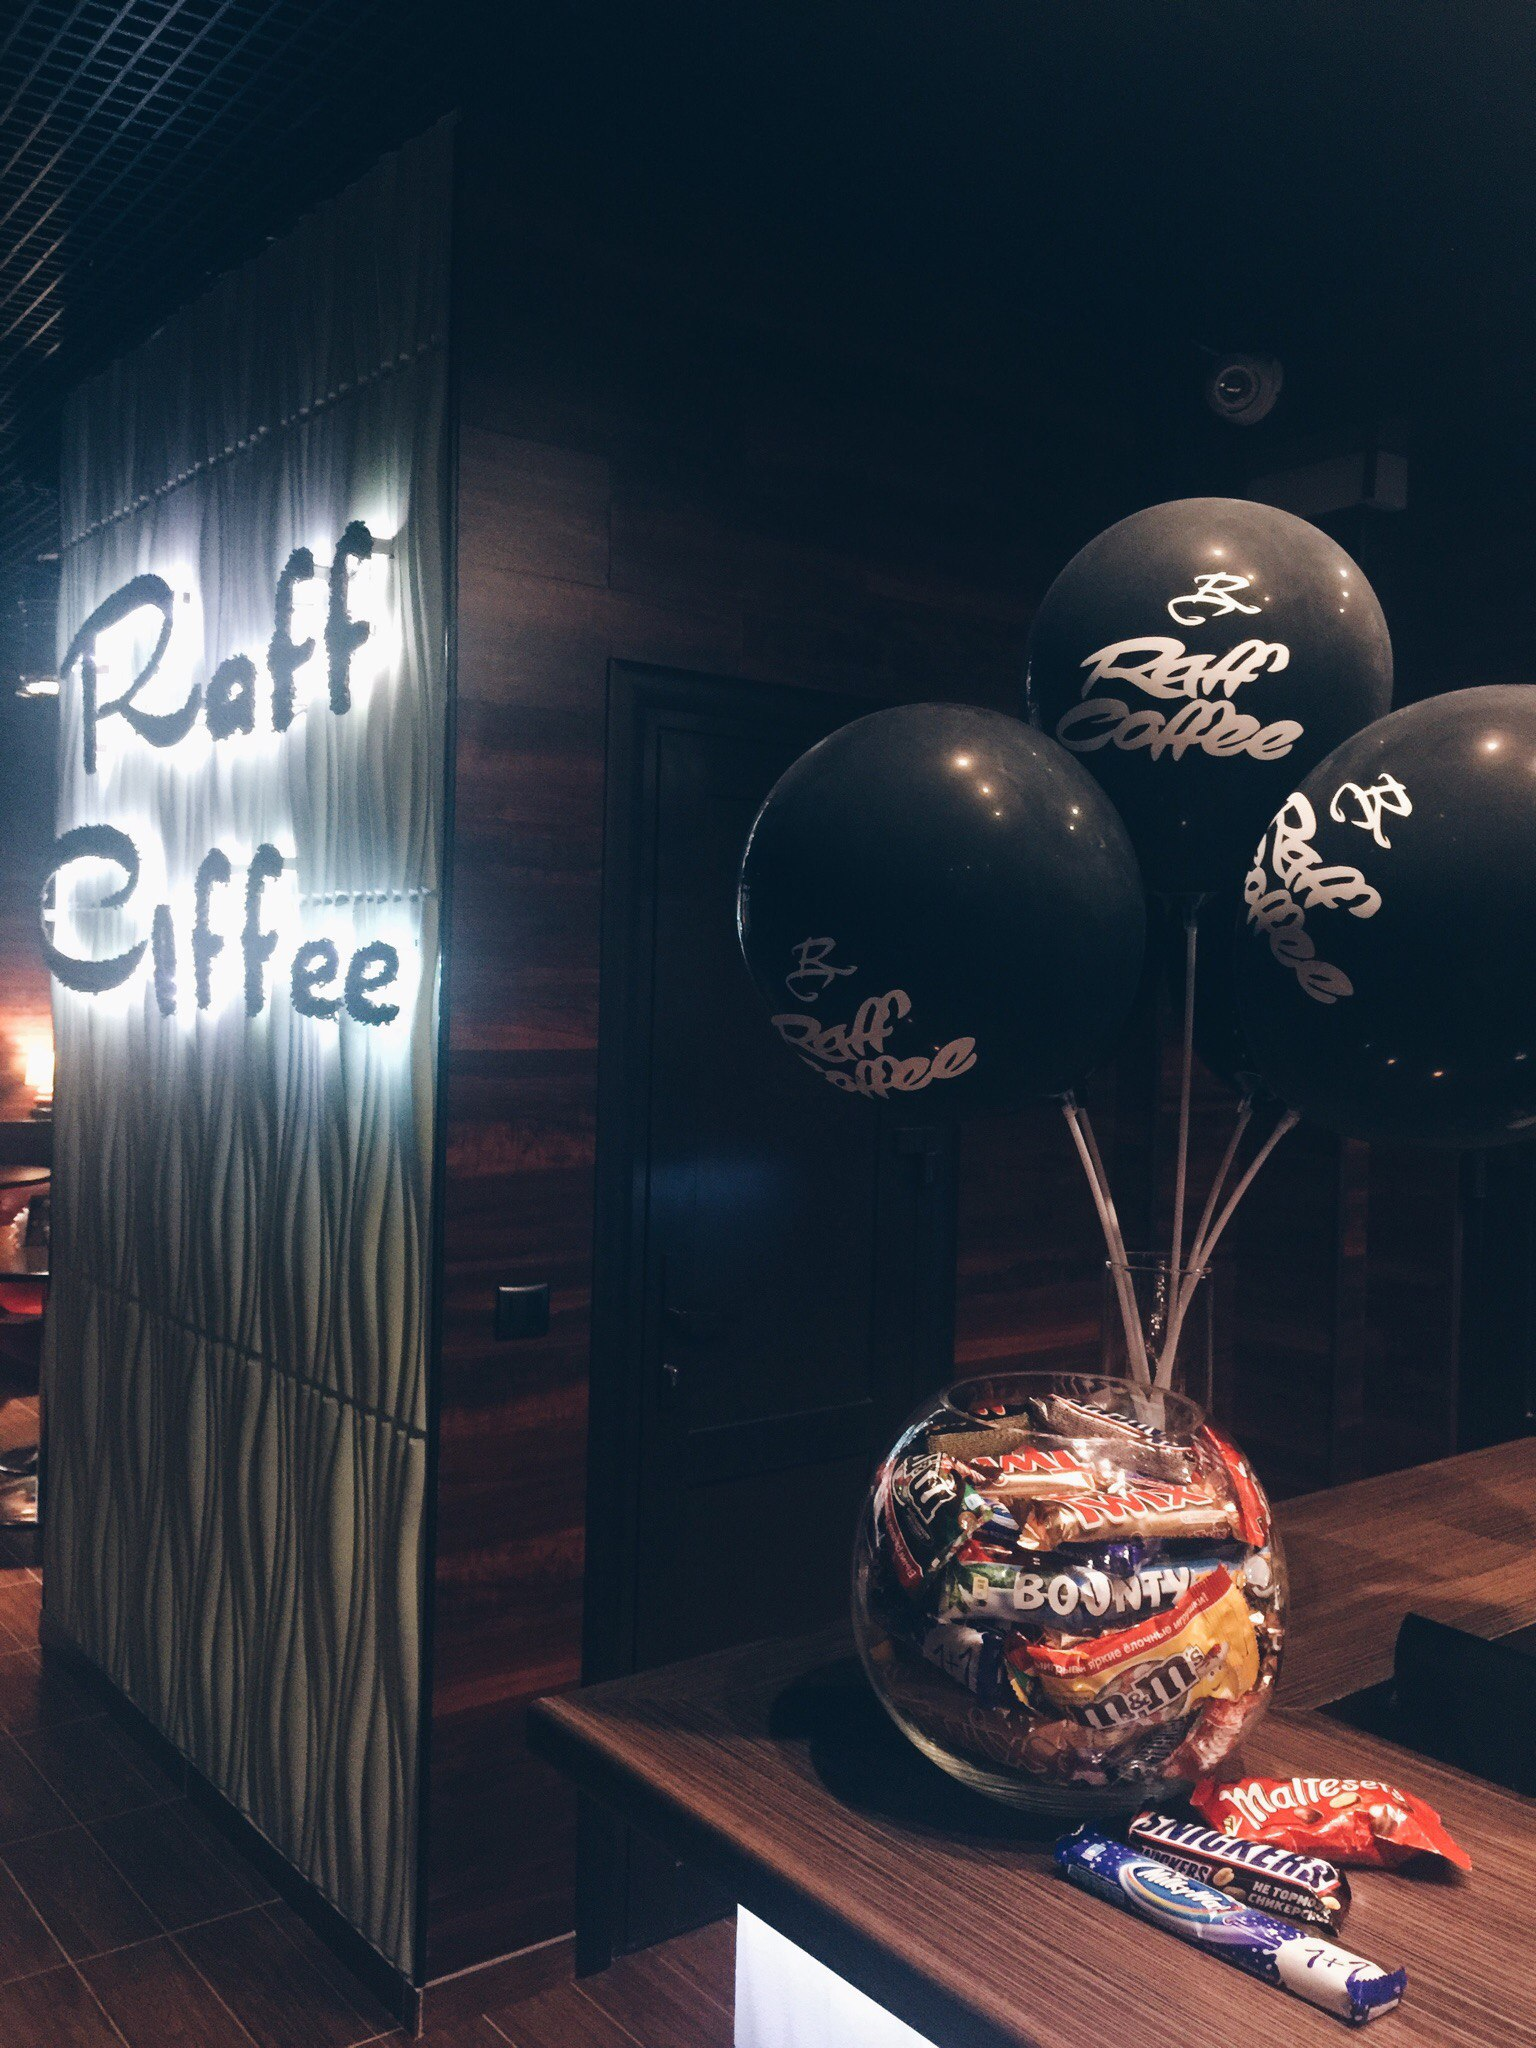 Кофейня «Raff Coffee» - Вконтакте